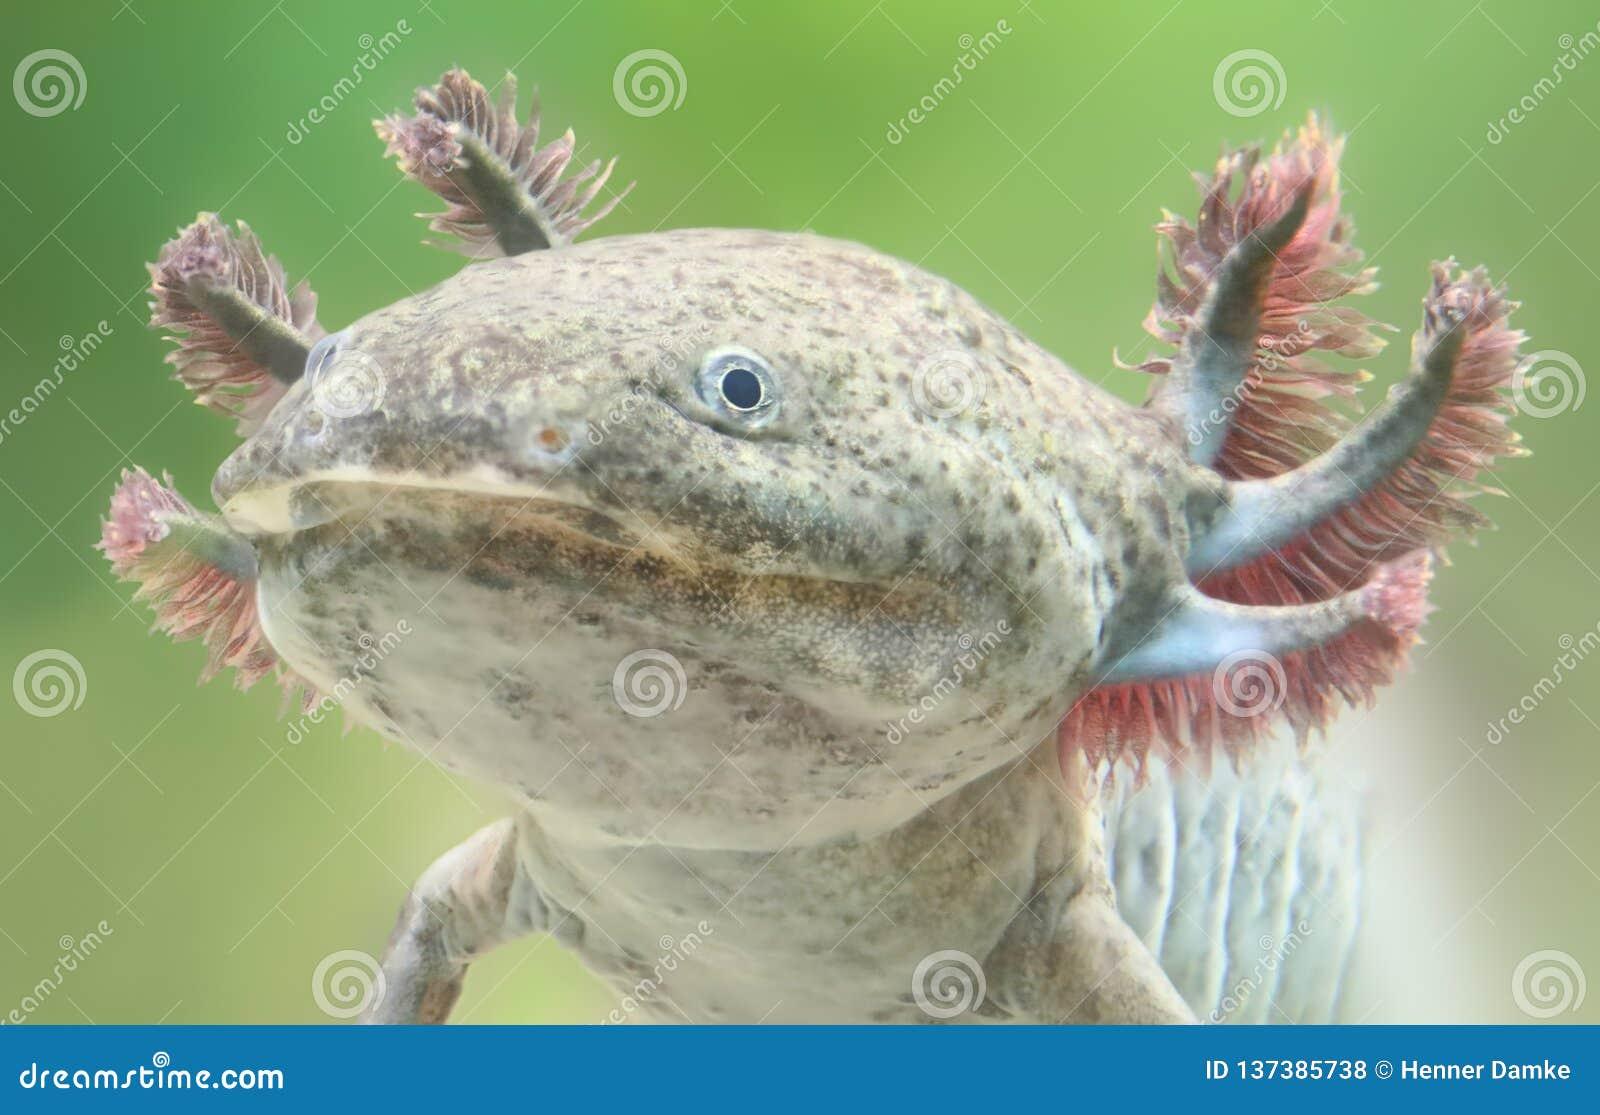 Close-upmening van een Axolotl